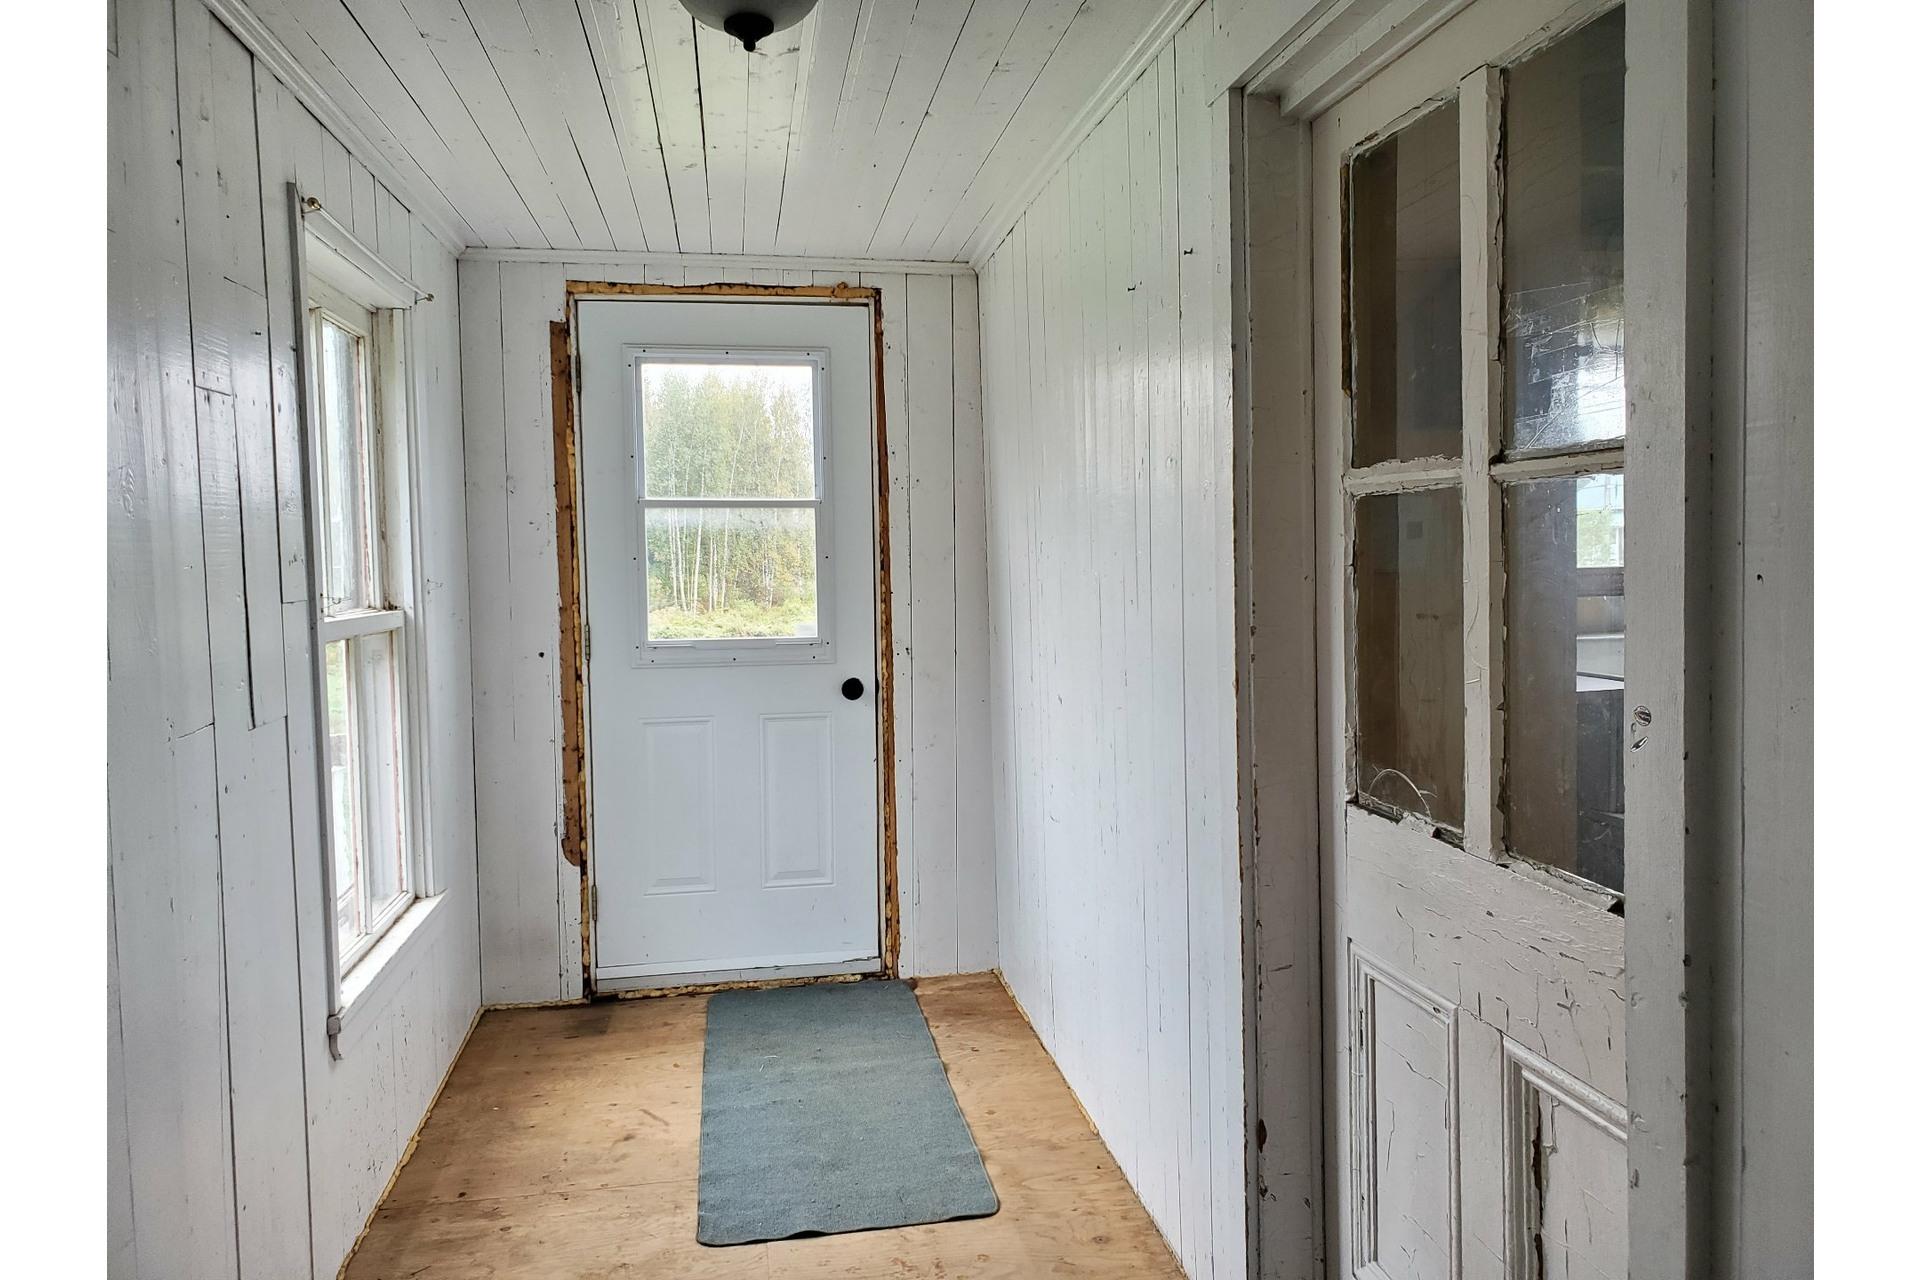 image 15 - Farmhouse For sale Sainte-Marie-de-Blandford - 10 rooms